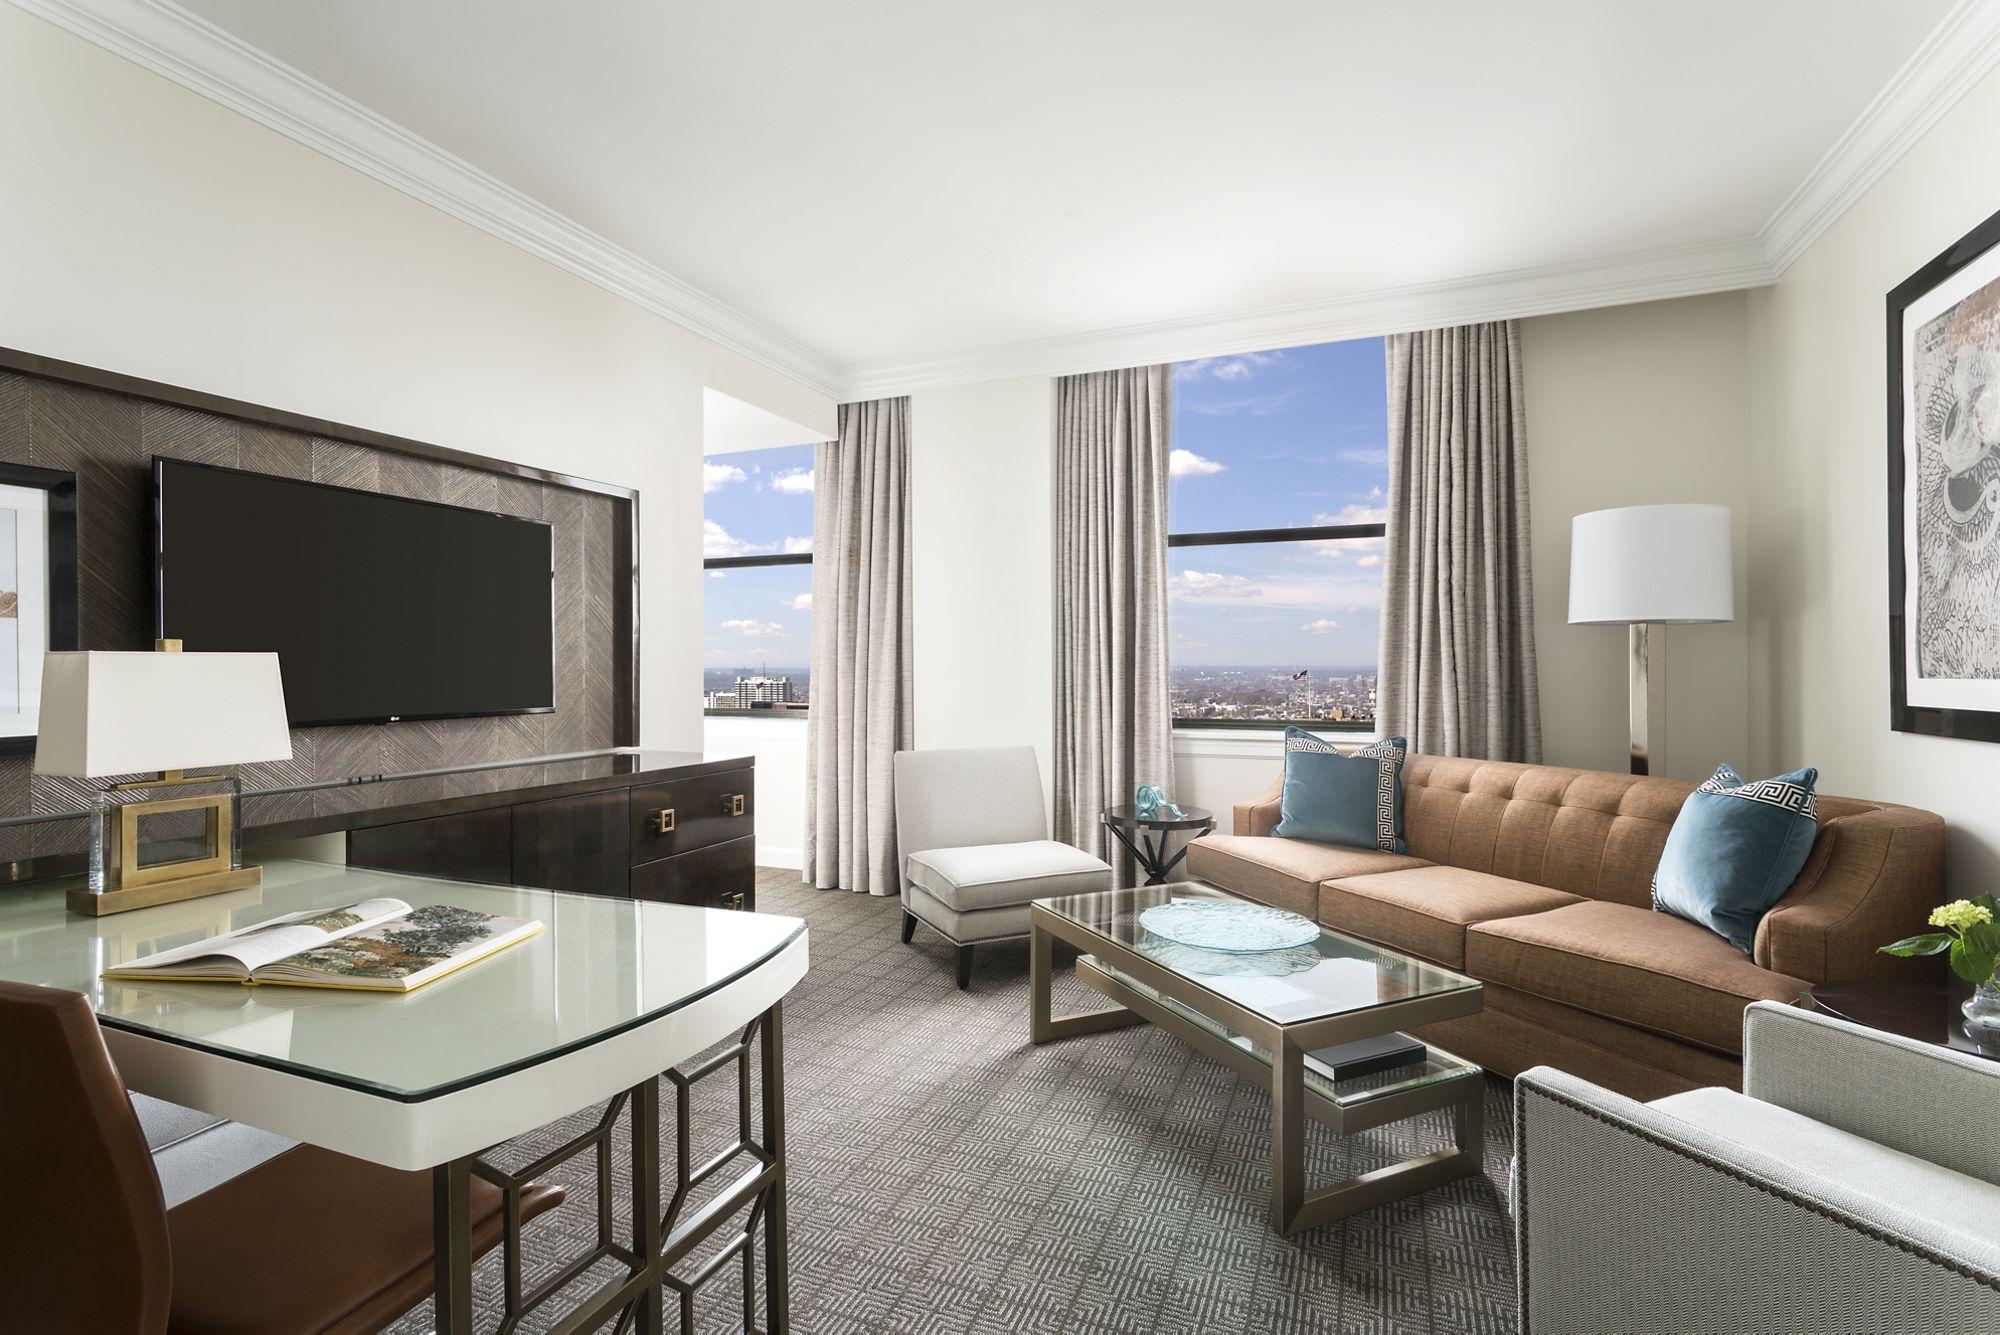 Enjoyable One Bedroom Suite The Ritz Carlton Philadelphia Unemploymentrelief Wooden Chair Designs For Living Room Unemploymentrelieforg